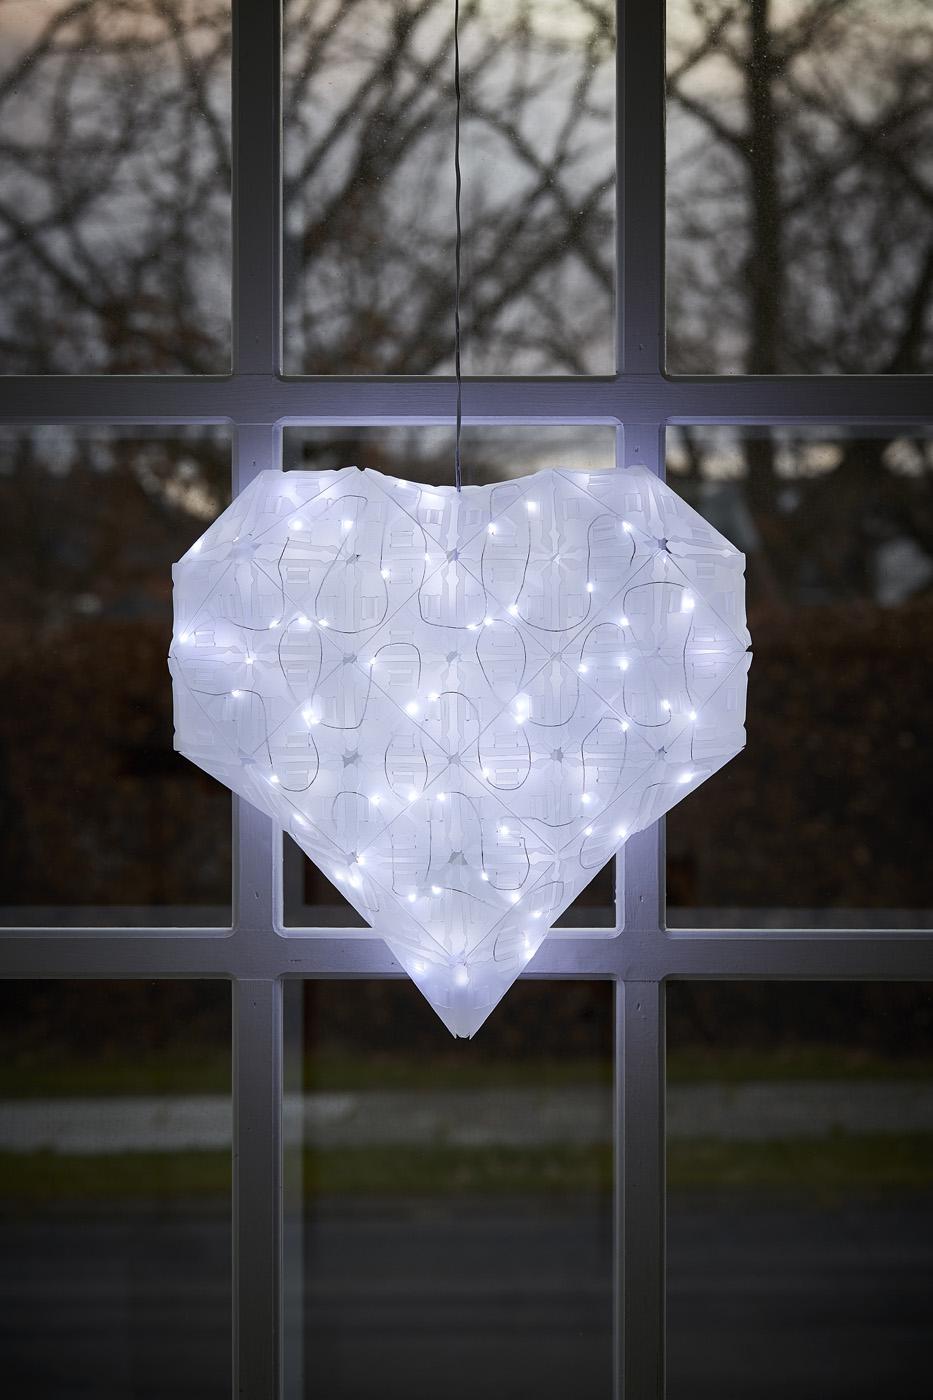 CREATTO_LIGHTS_CHRISTMAS_HEART_BIG.jpg